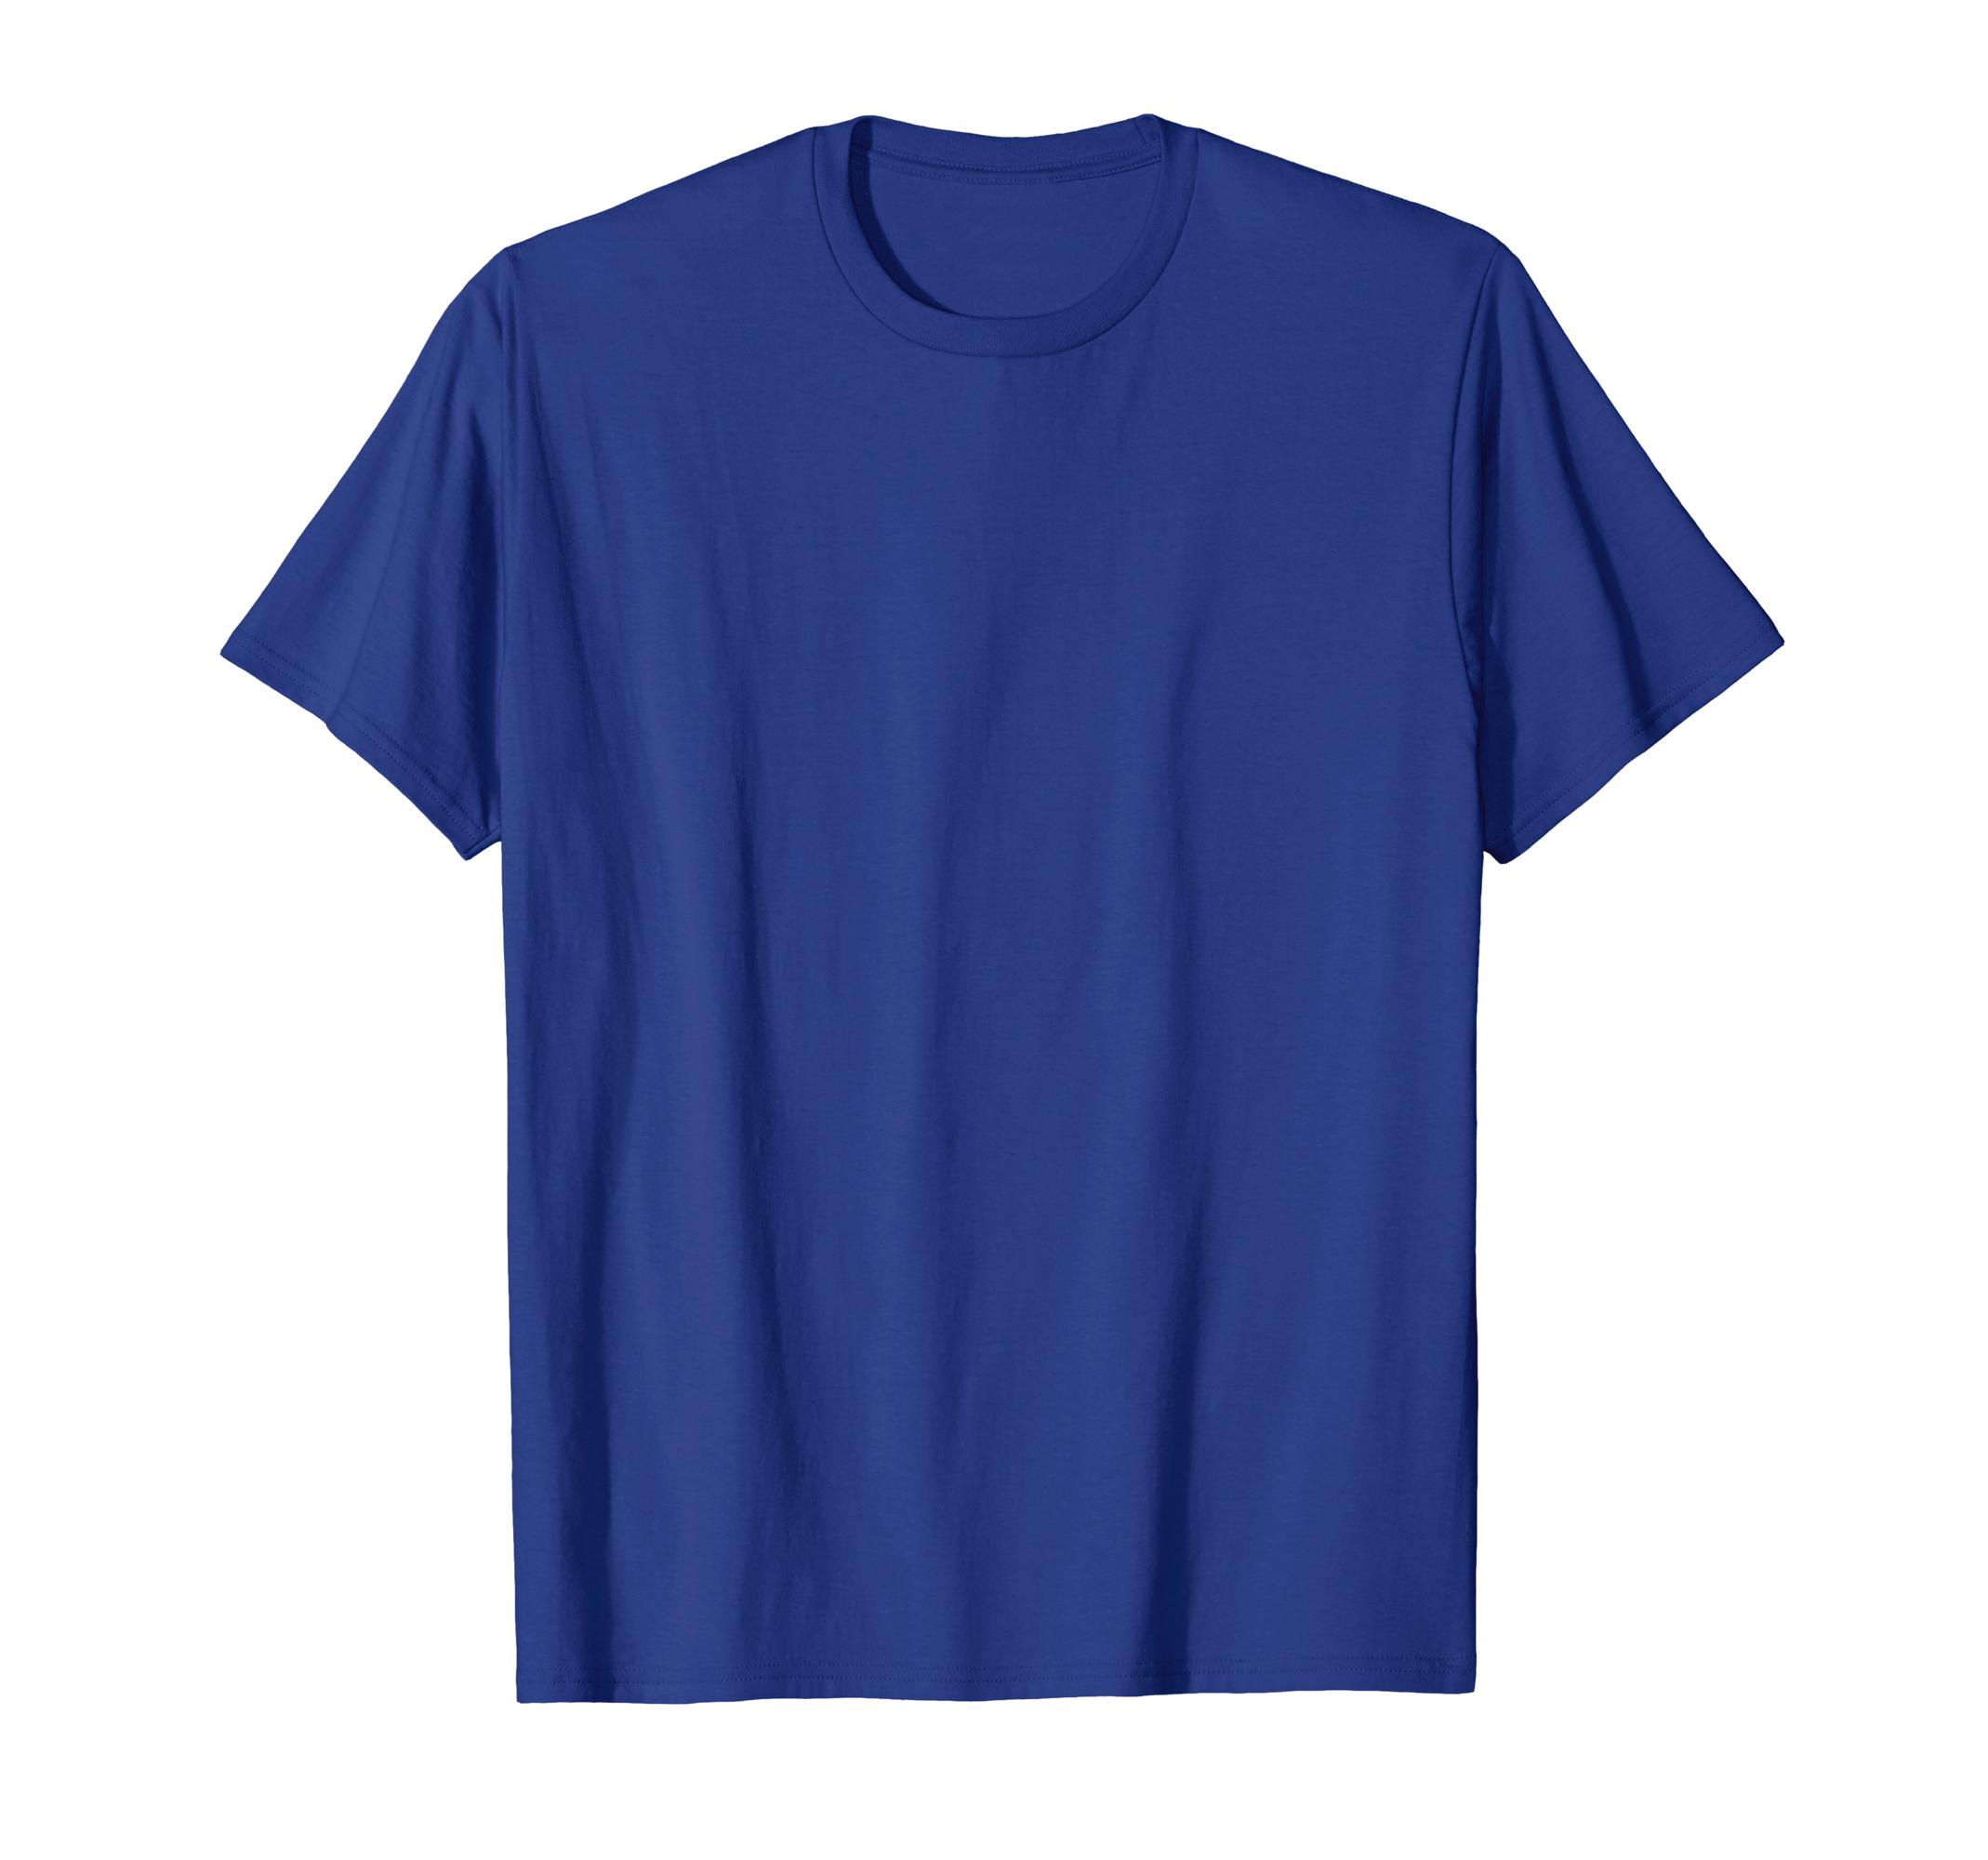 Nick Rewind Good Burger T-Shirt